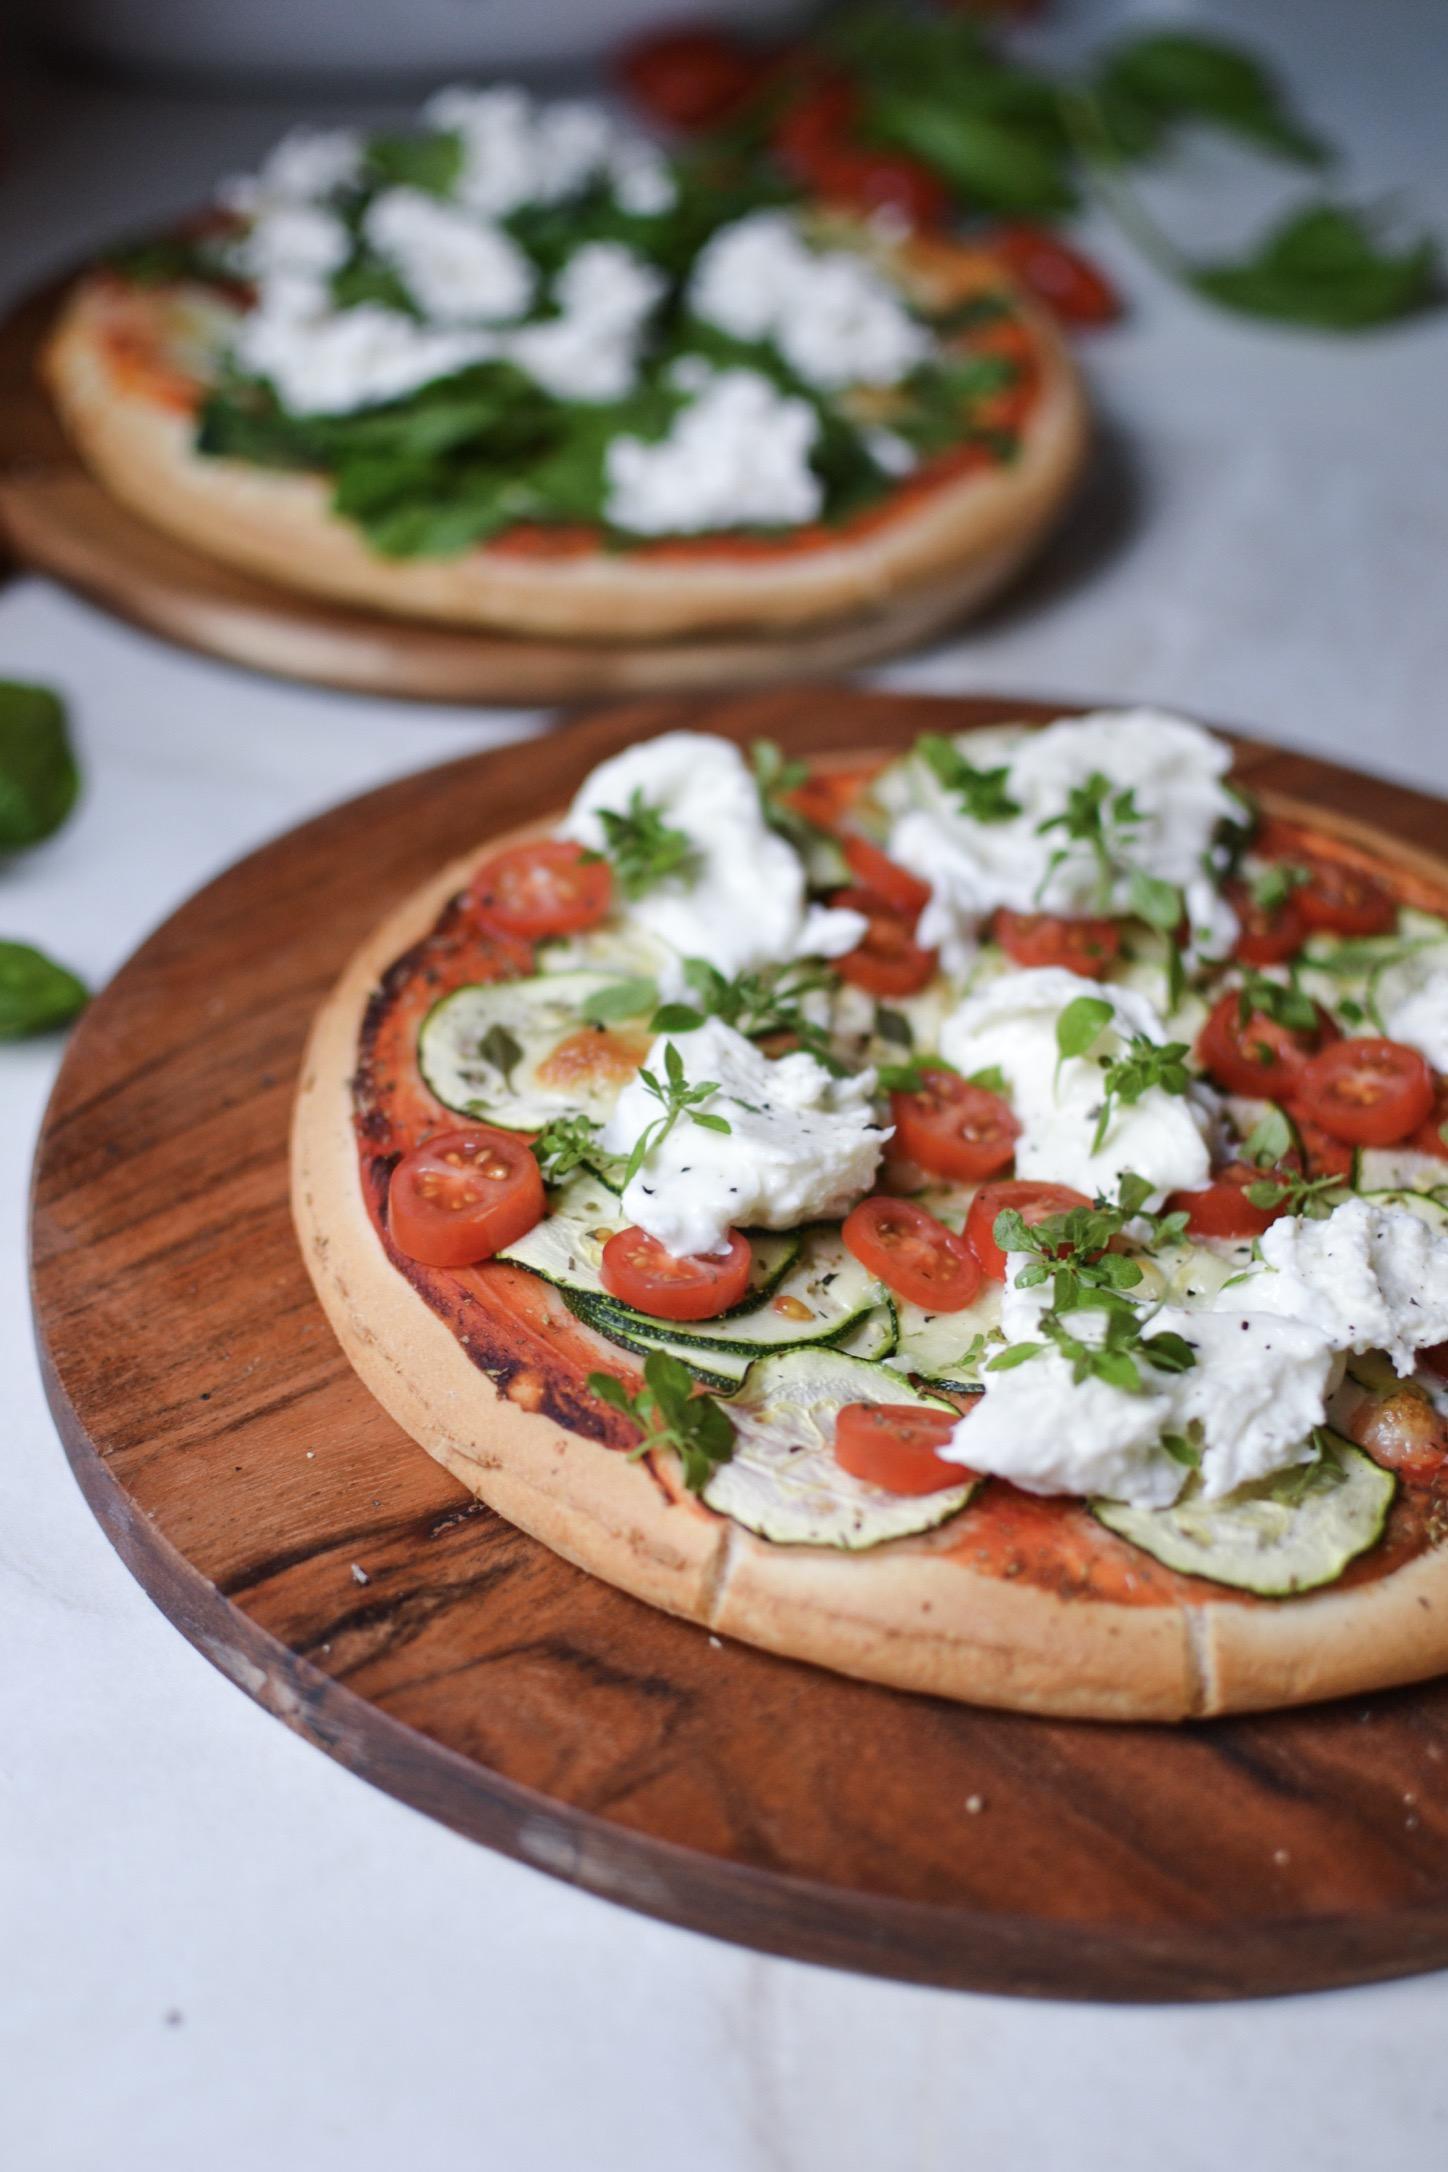 1 journée sans gluten : Pizza sans gluten